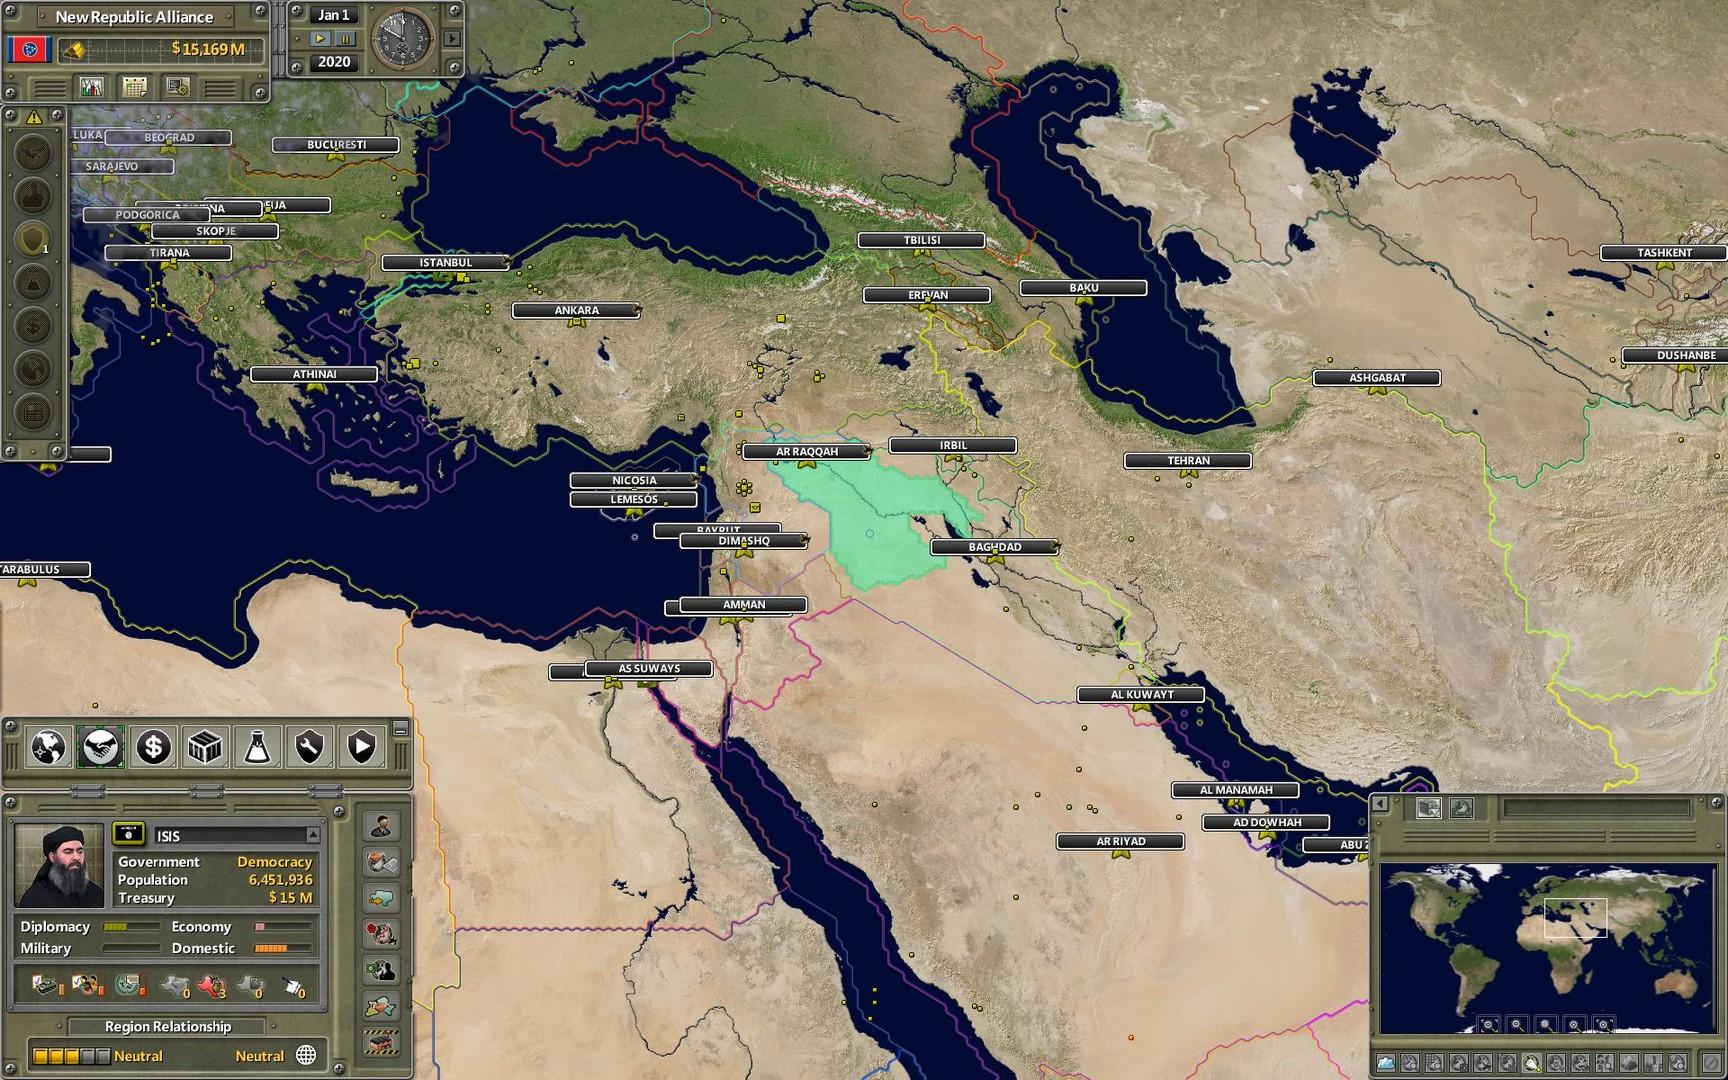 Supreme Ruler 2020 Map Editor - opolisxsonar